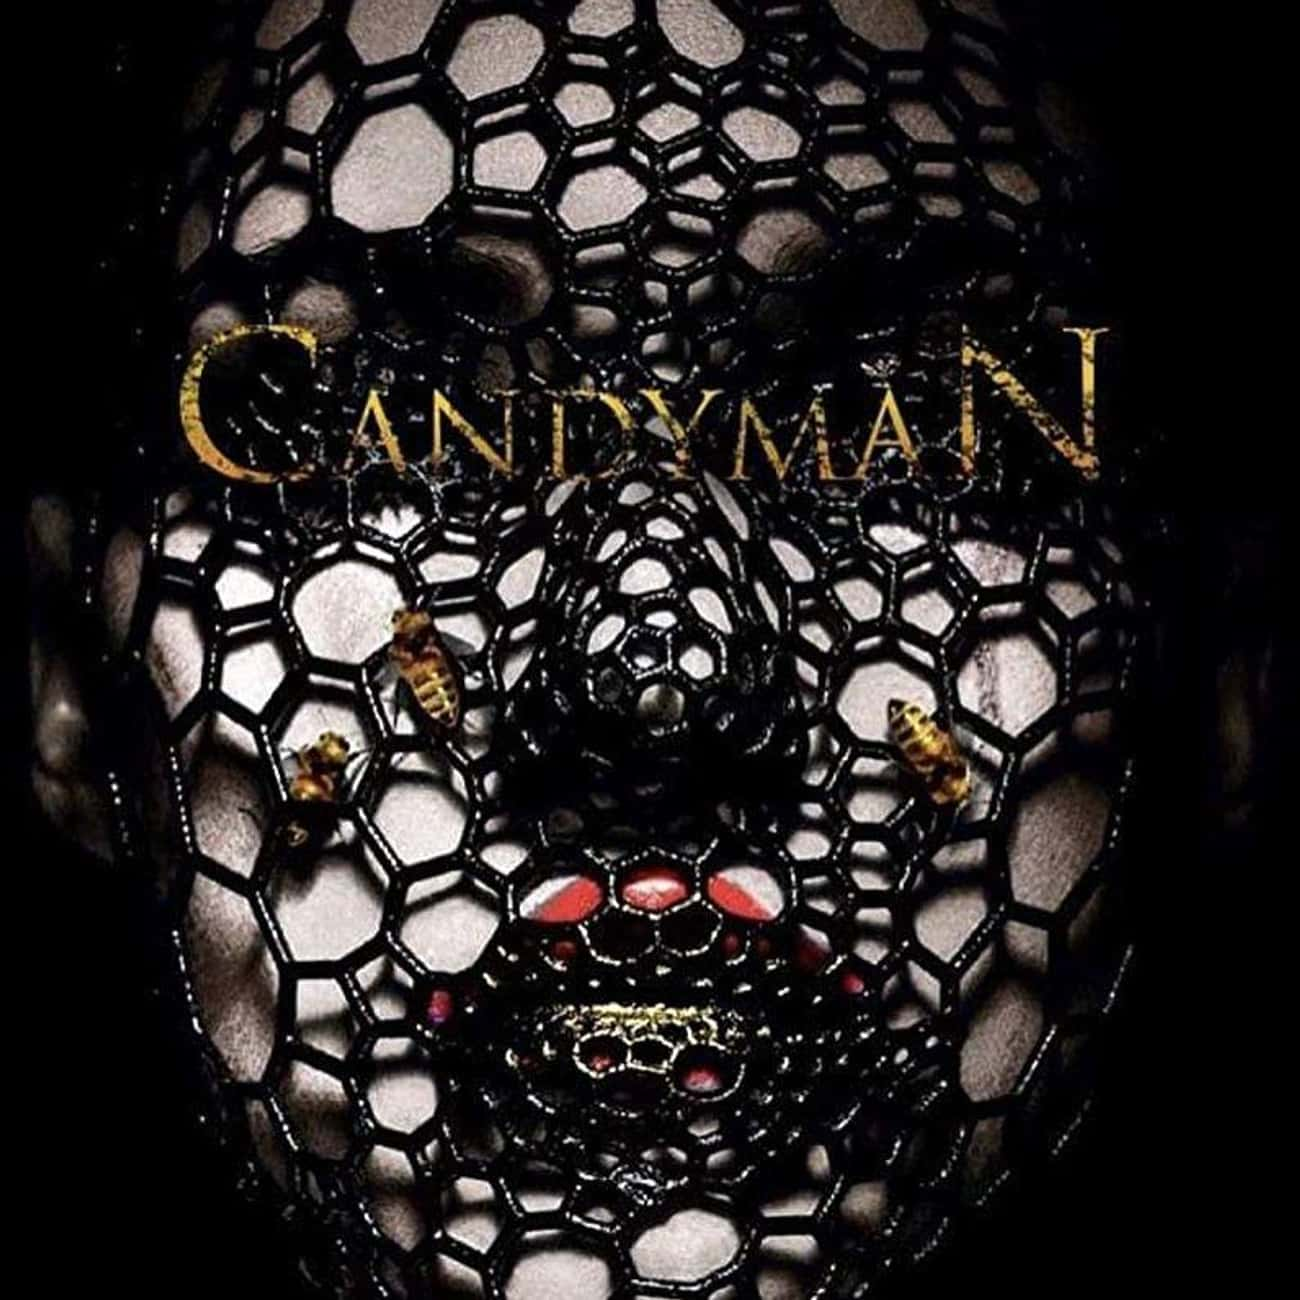 'Candyman' Drops Sweet New Trailer